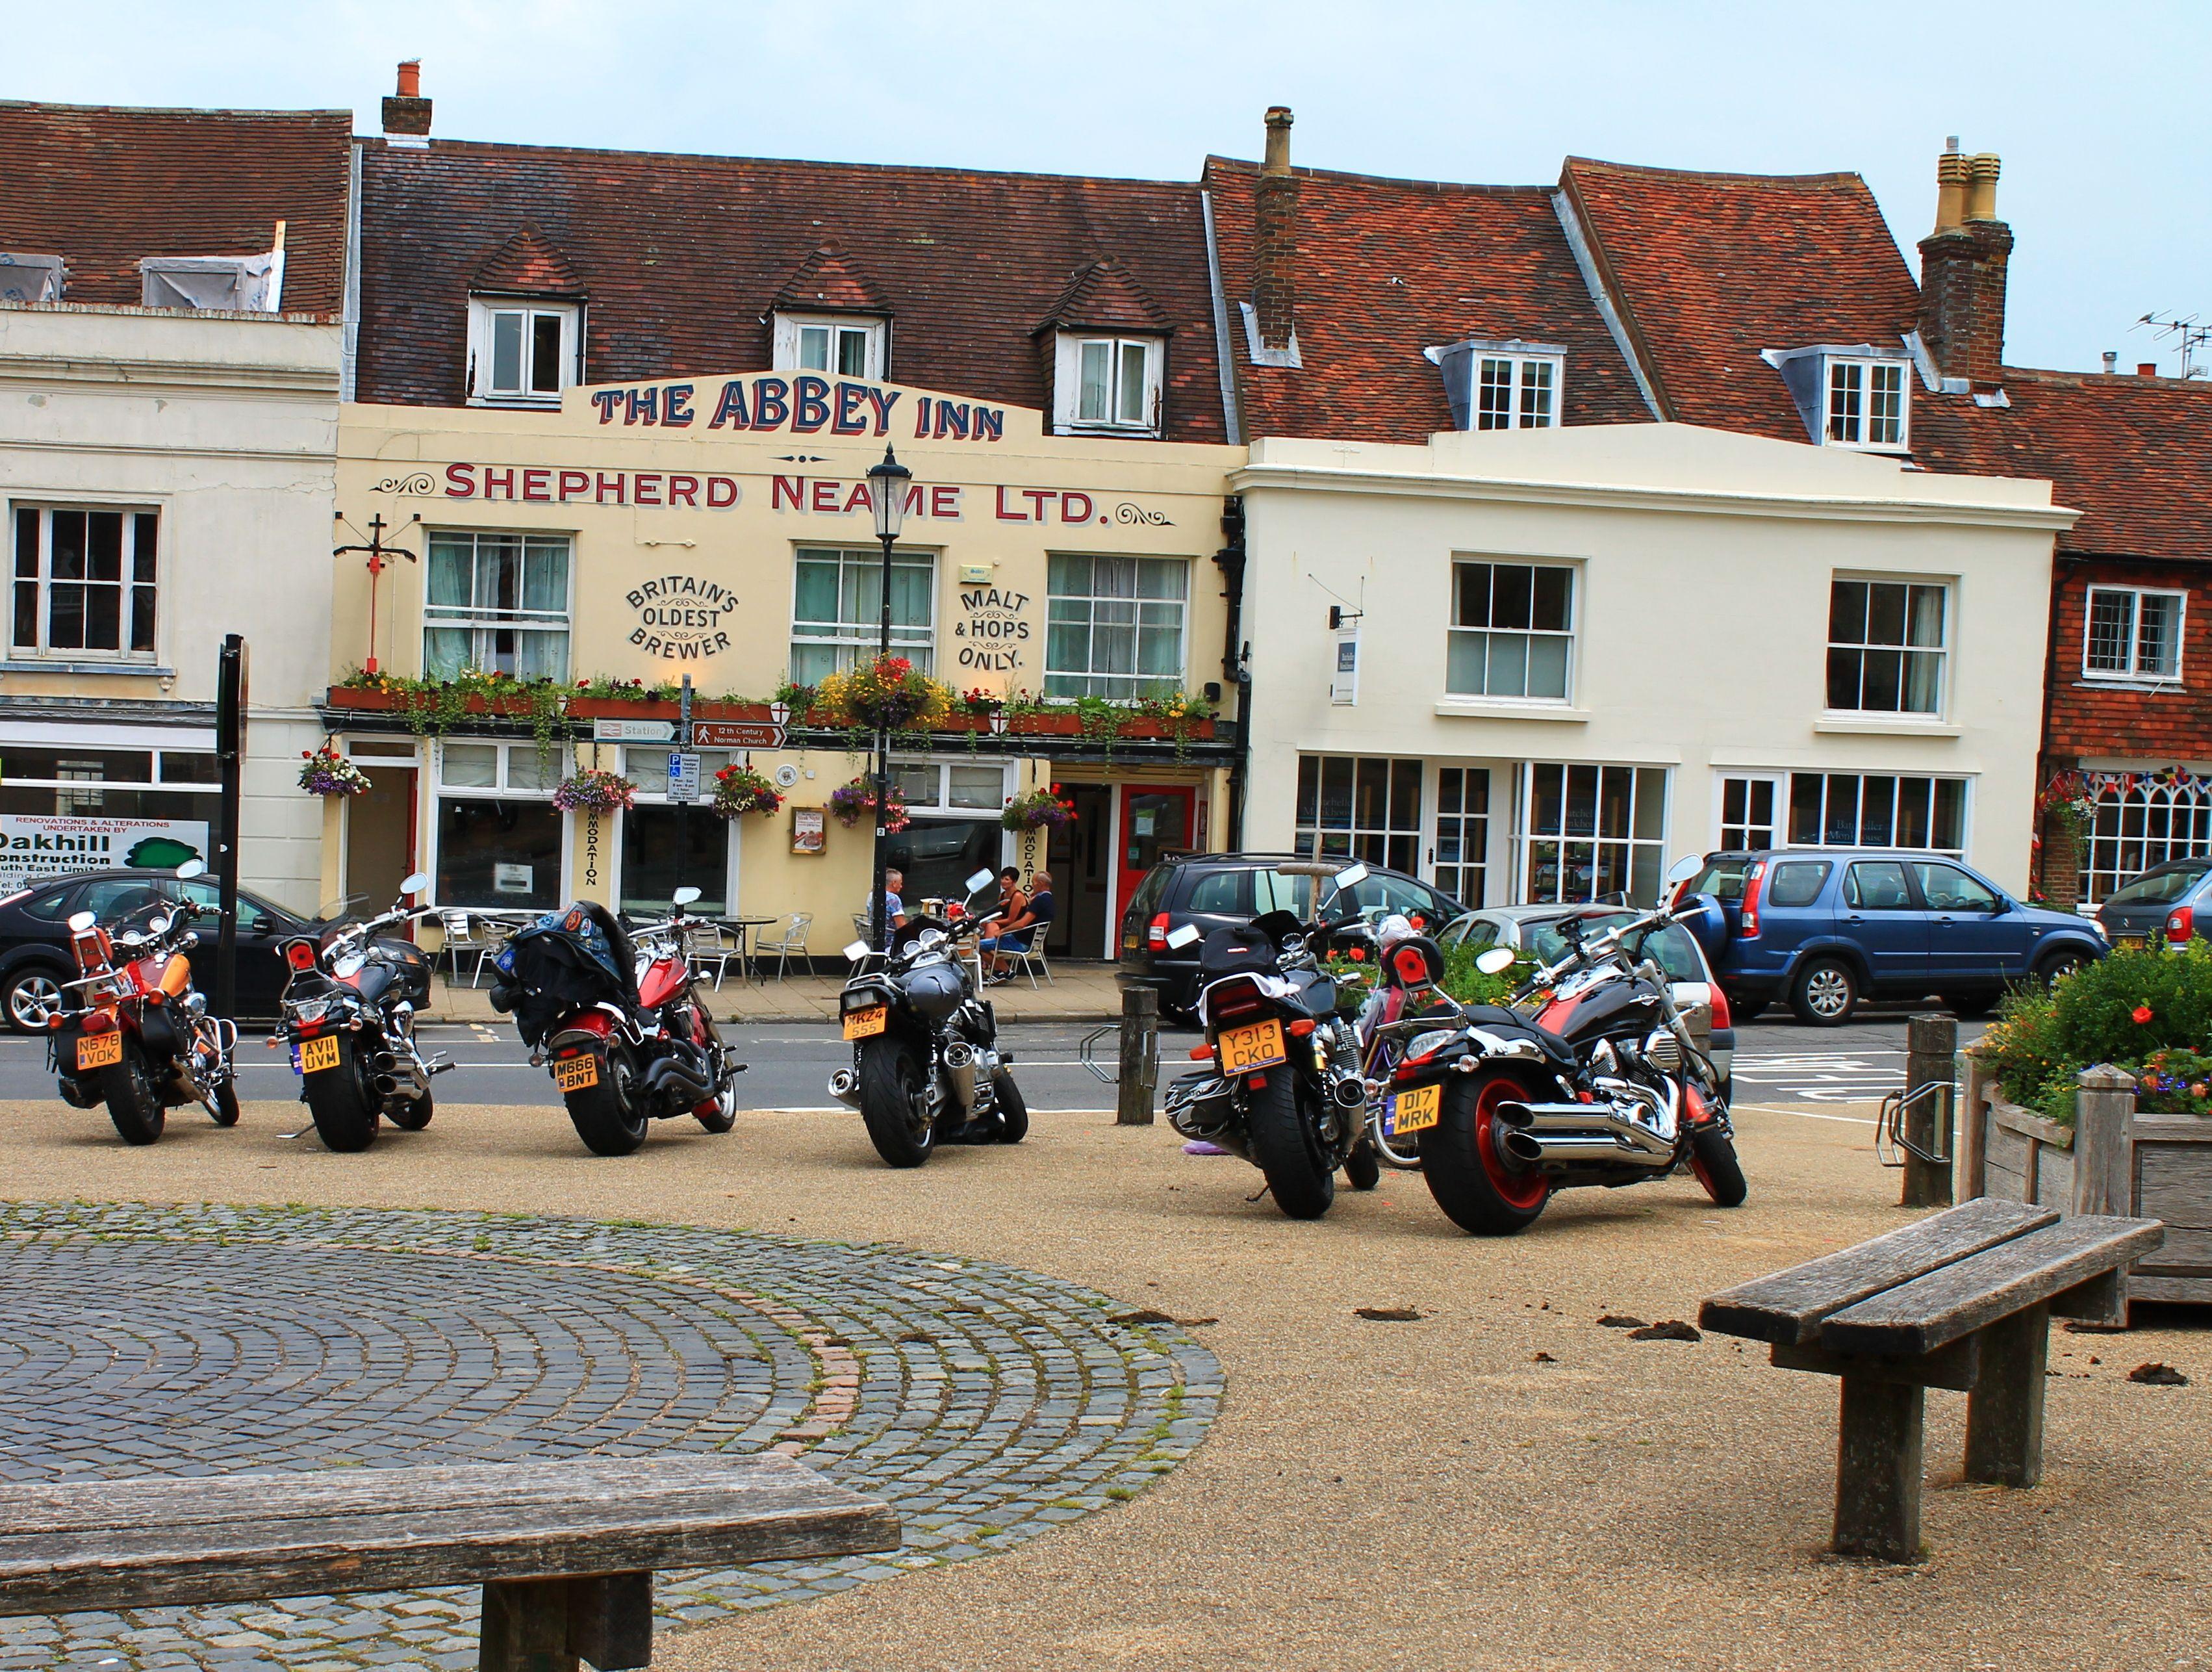 The Abbey Inn, Battle, East Sussex.